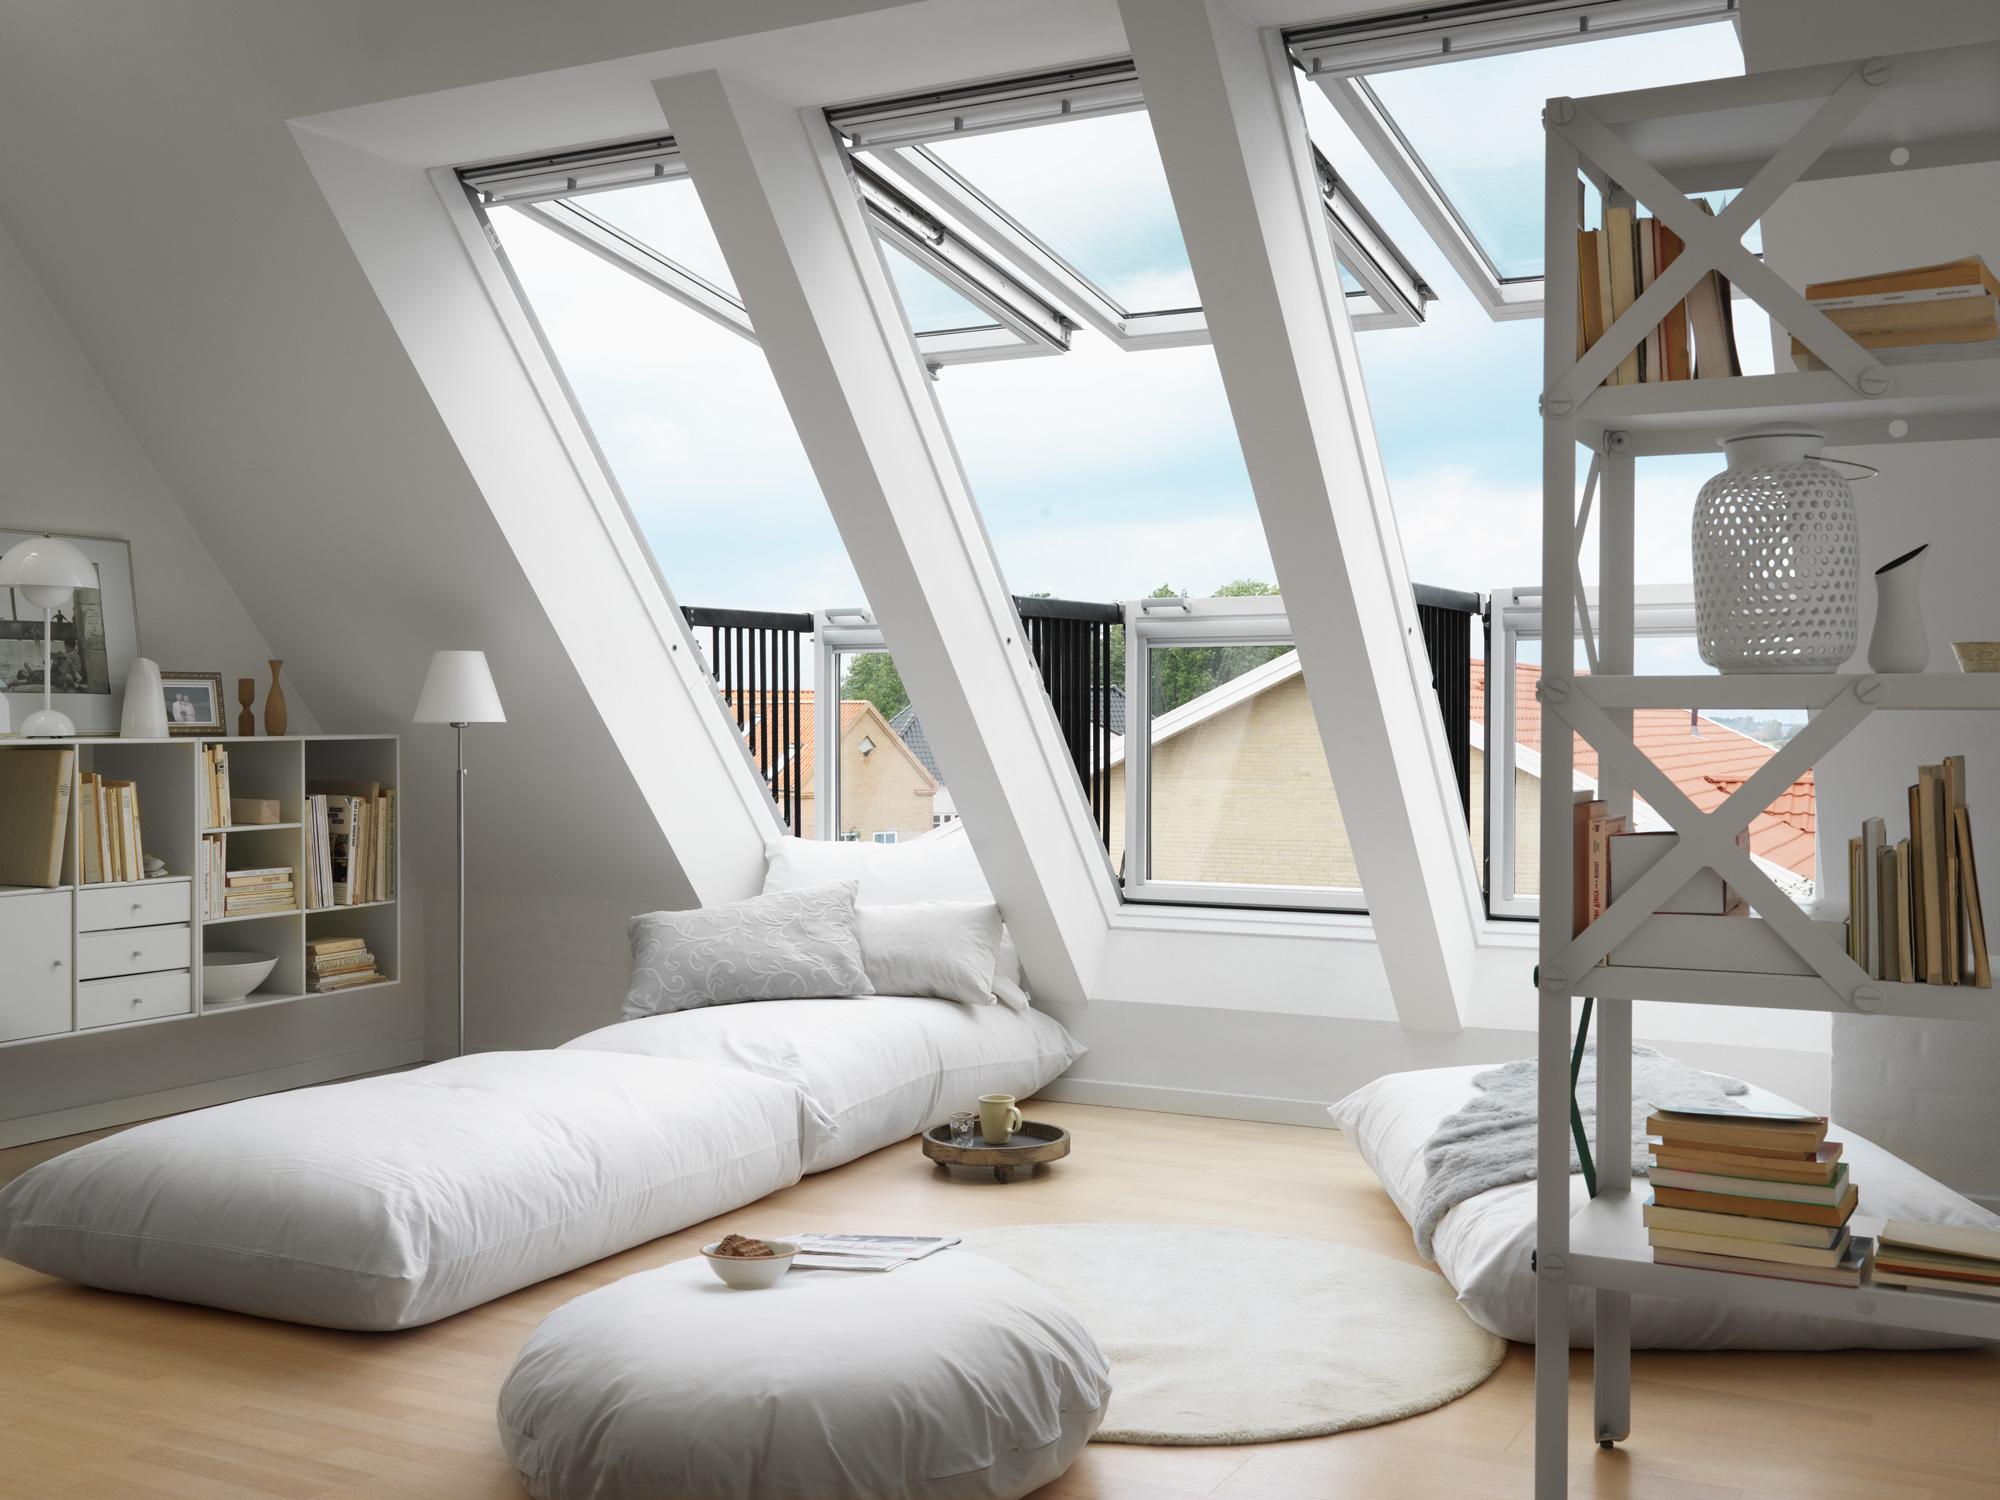 La finestra a balcone: belvedere a sorpresa - Mansarda.it